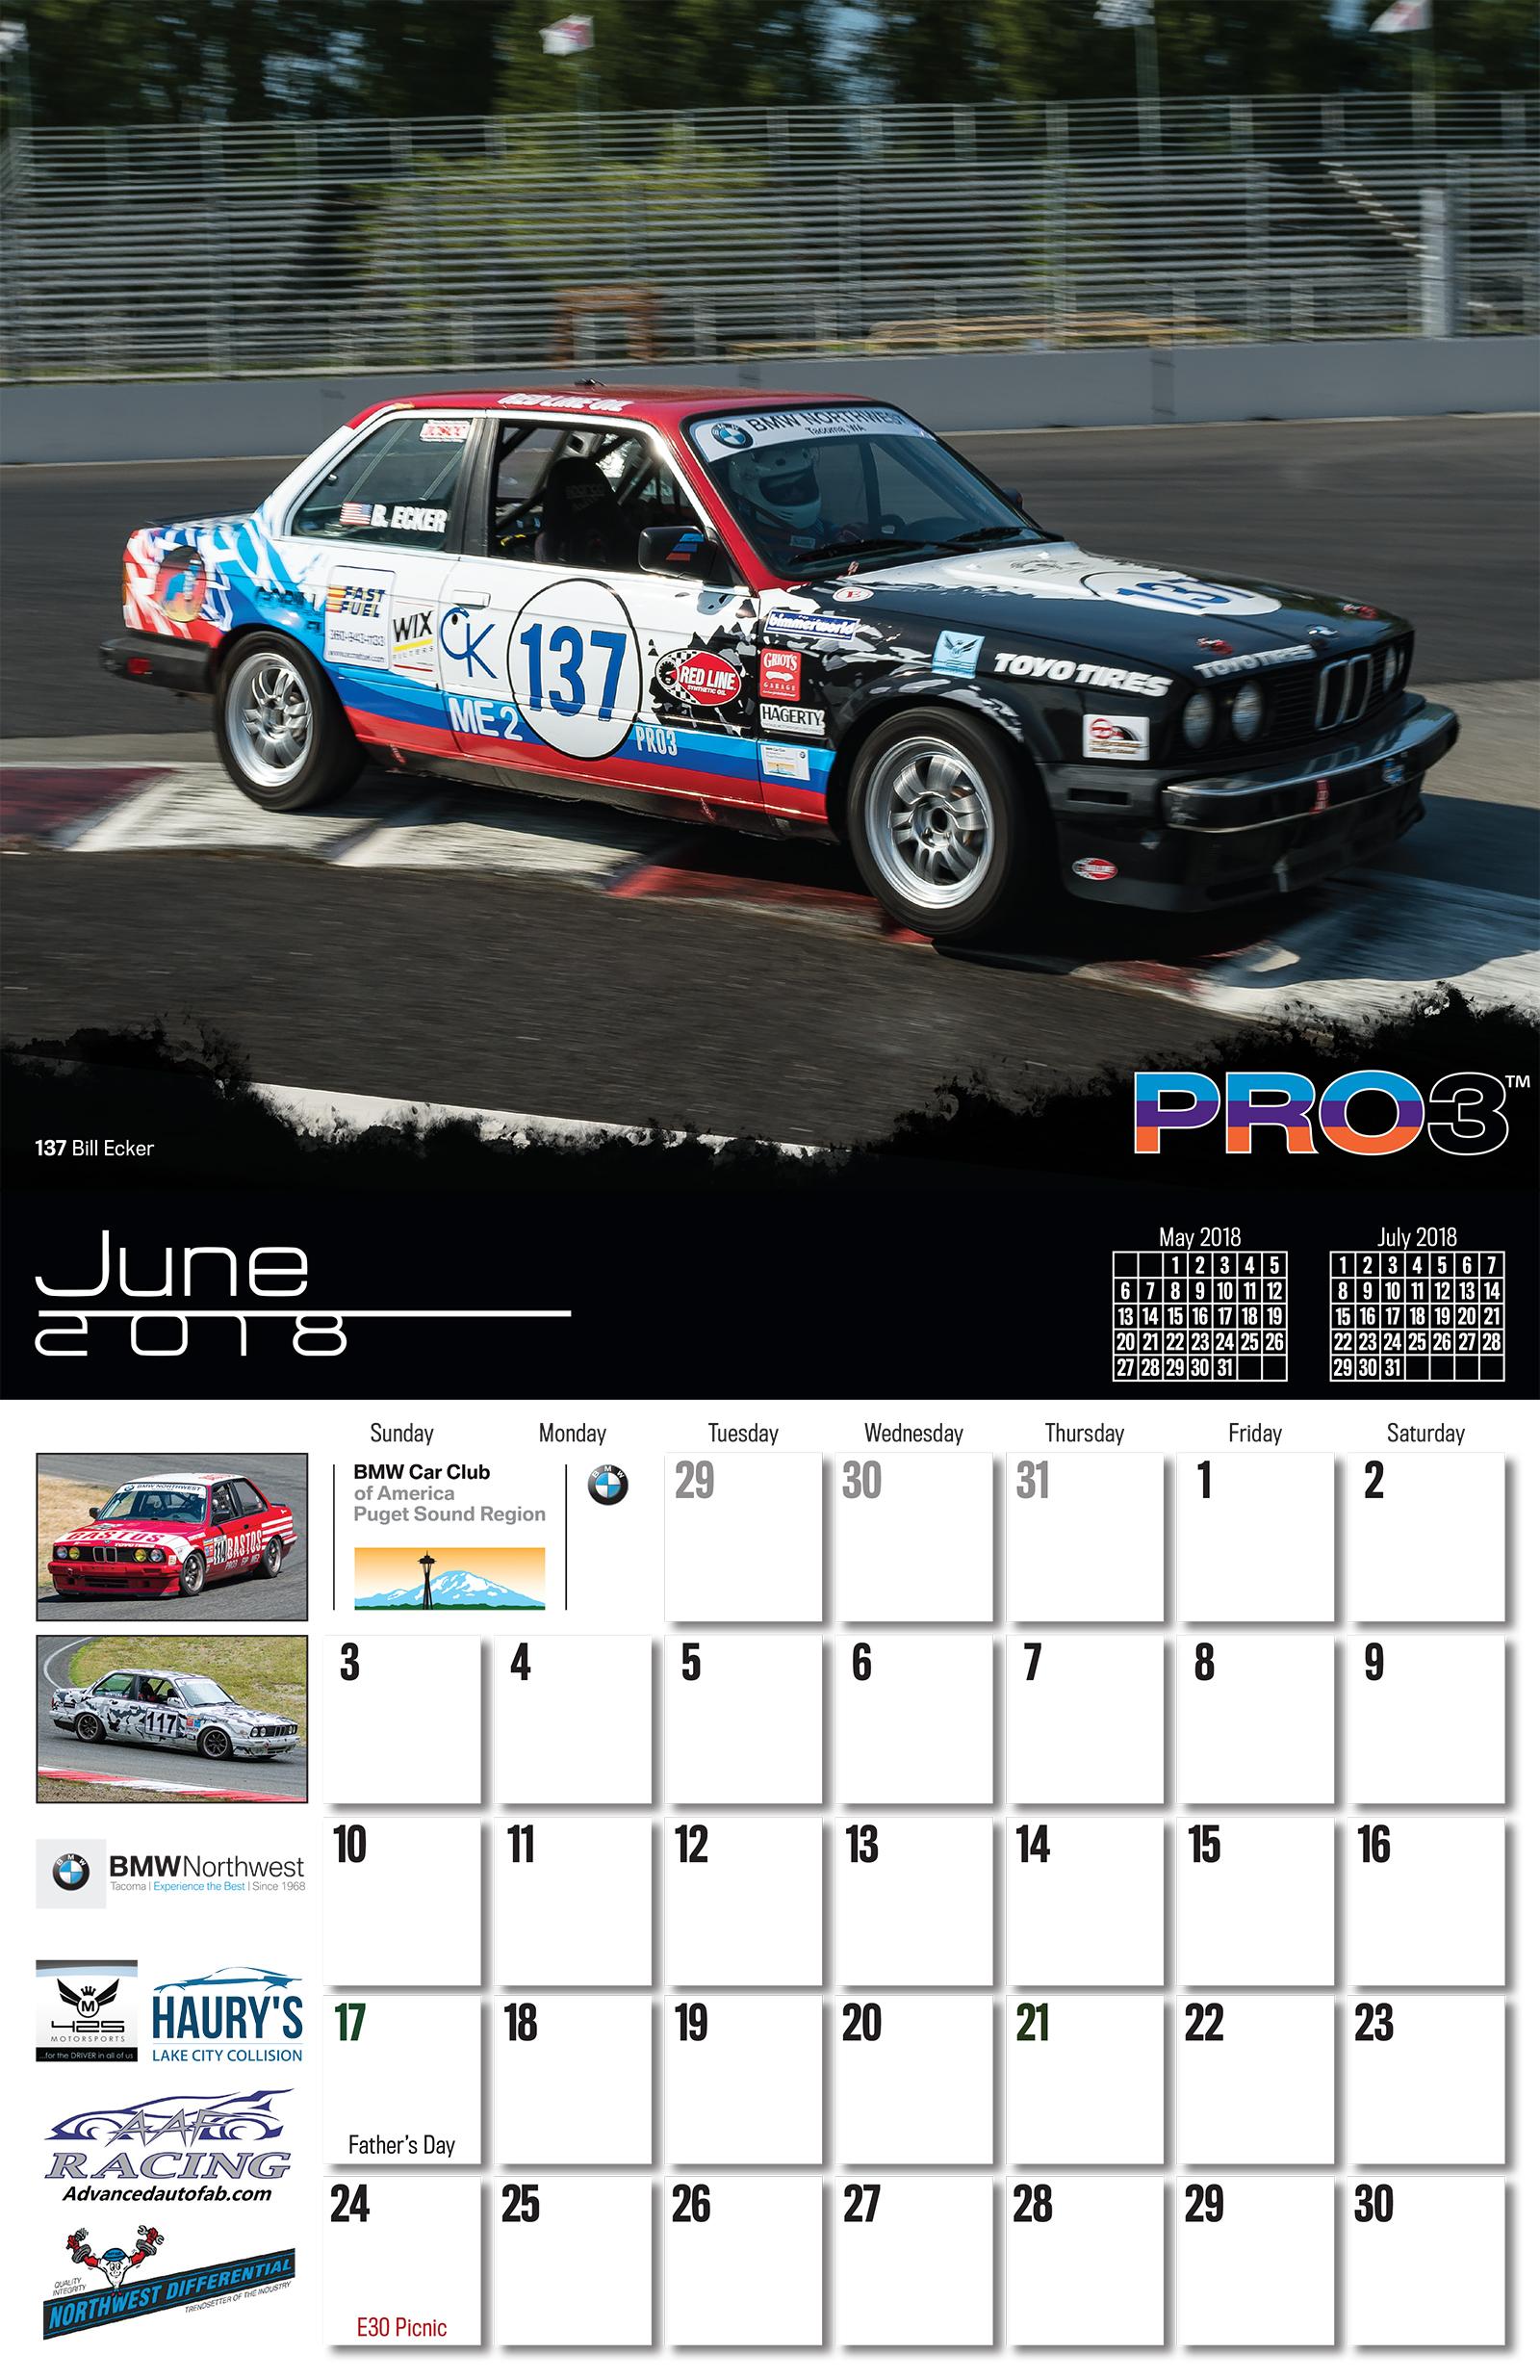 PRO3_Calendar_2018_06-June.jpg